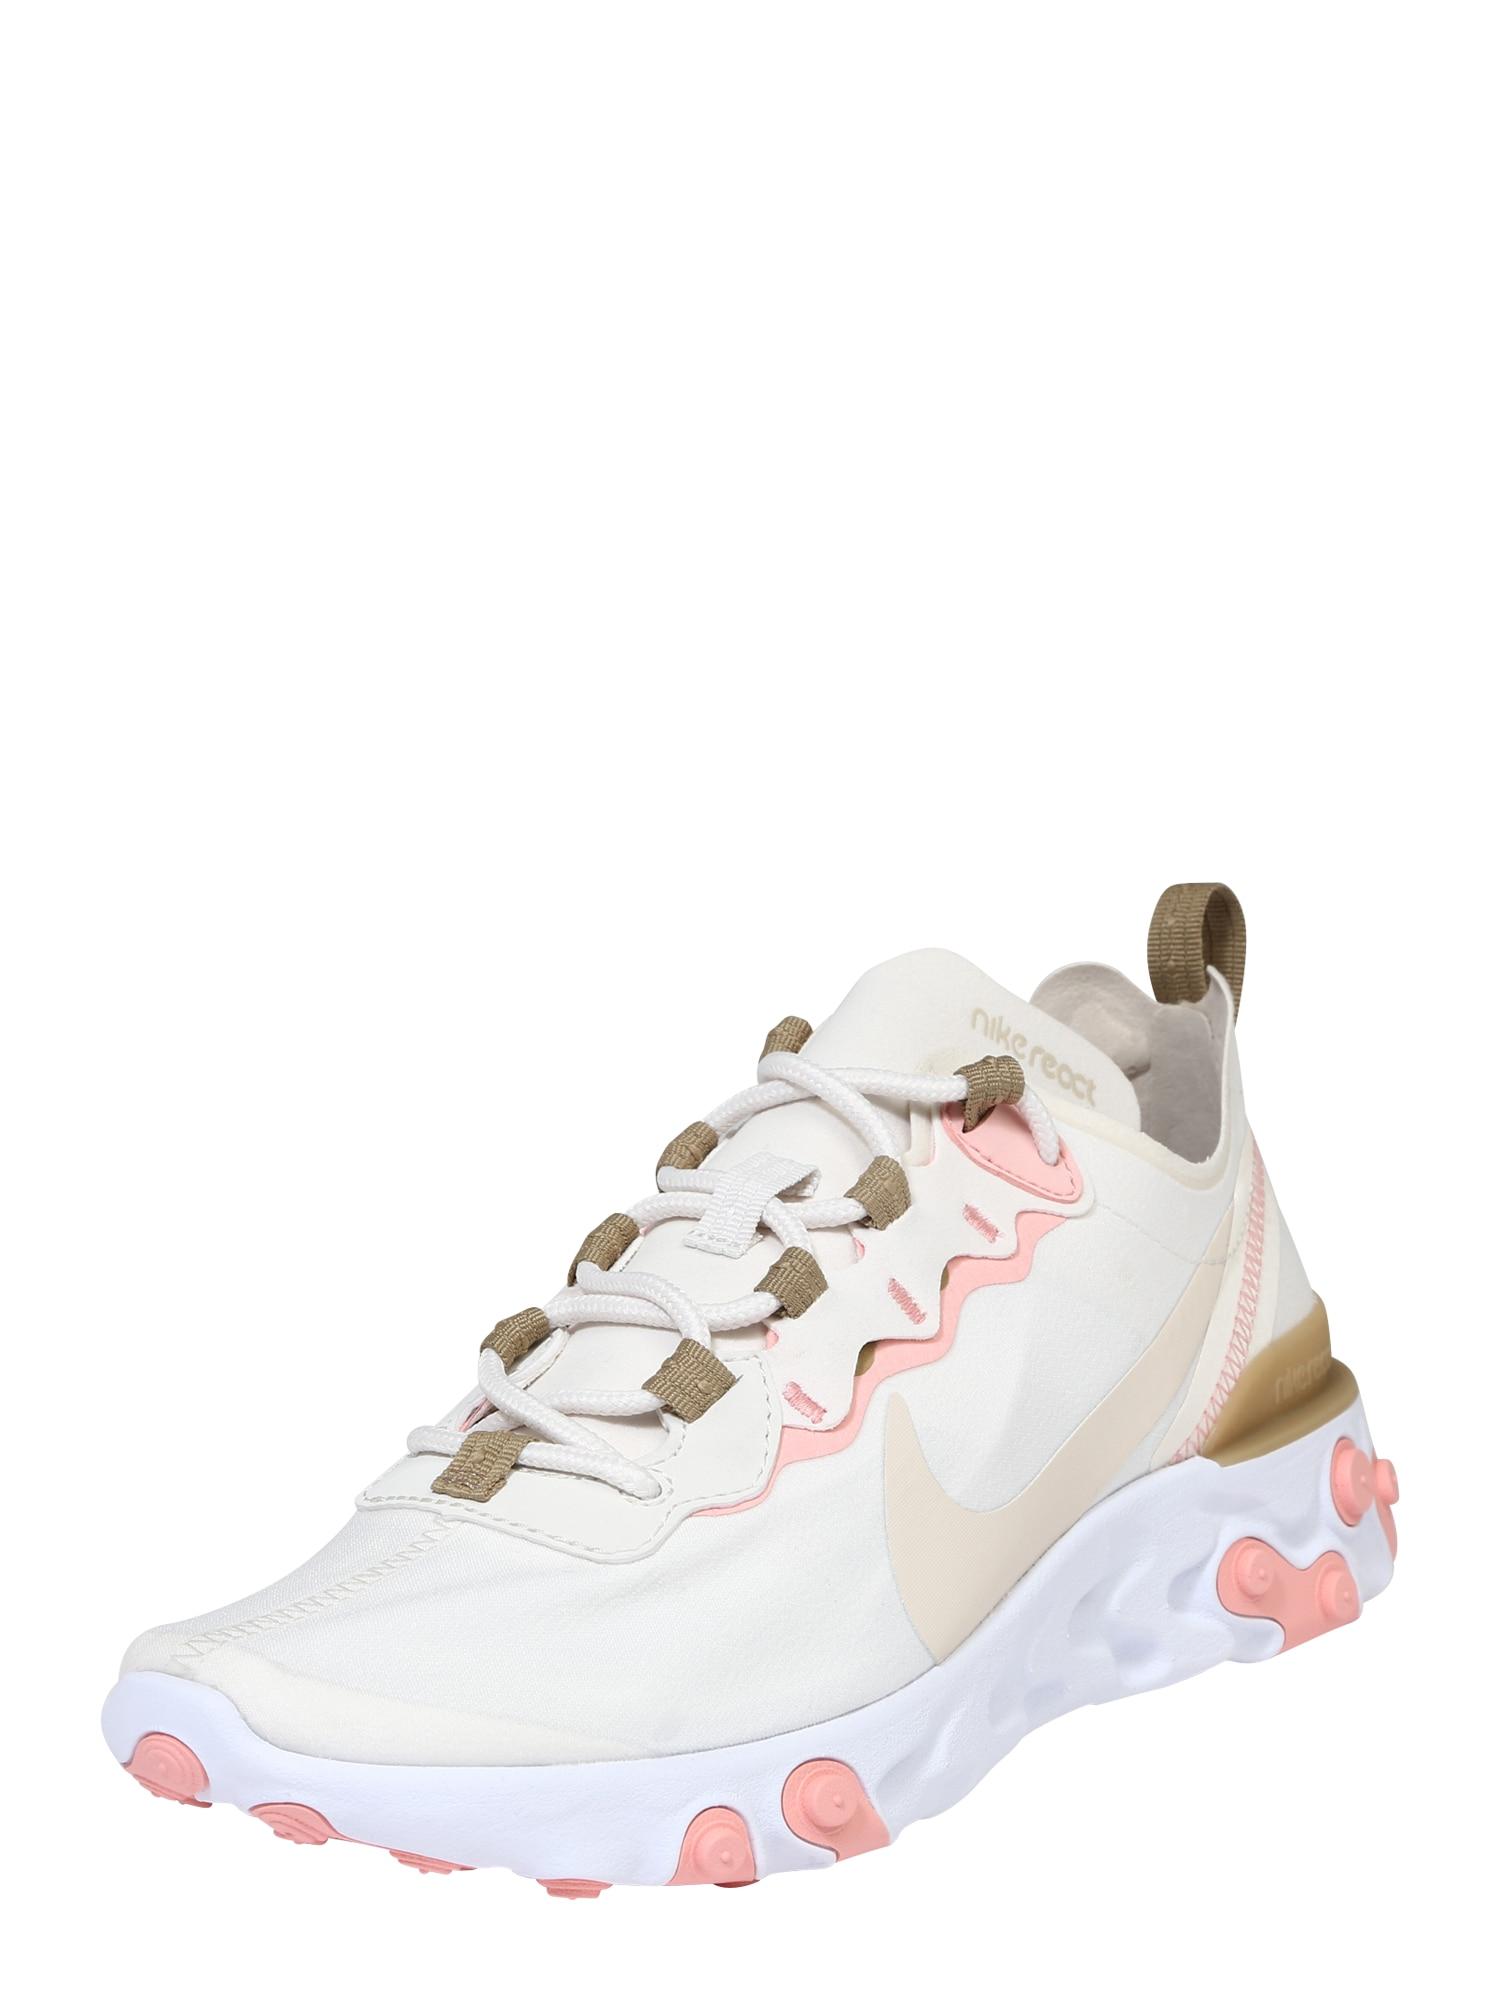 Nike Sportswear Nízke tenisky 'React 55'  ružová / biela / béžová